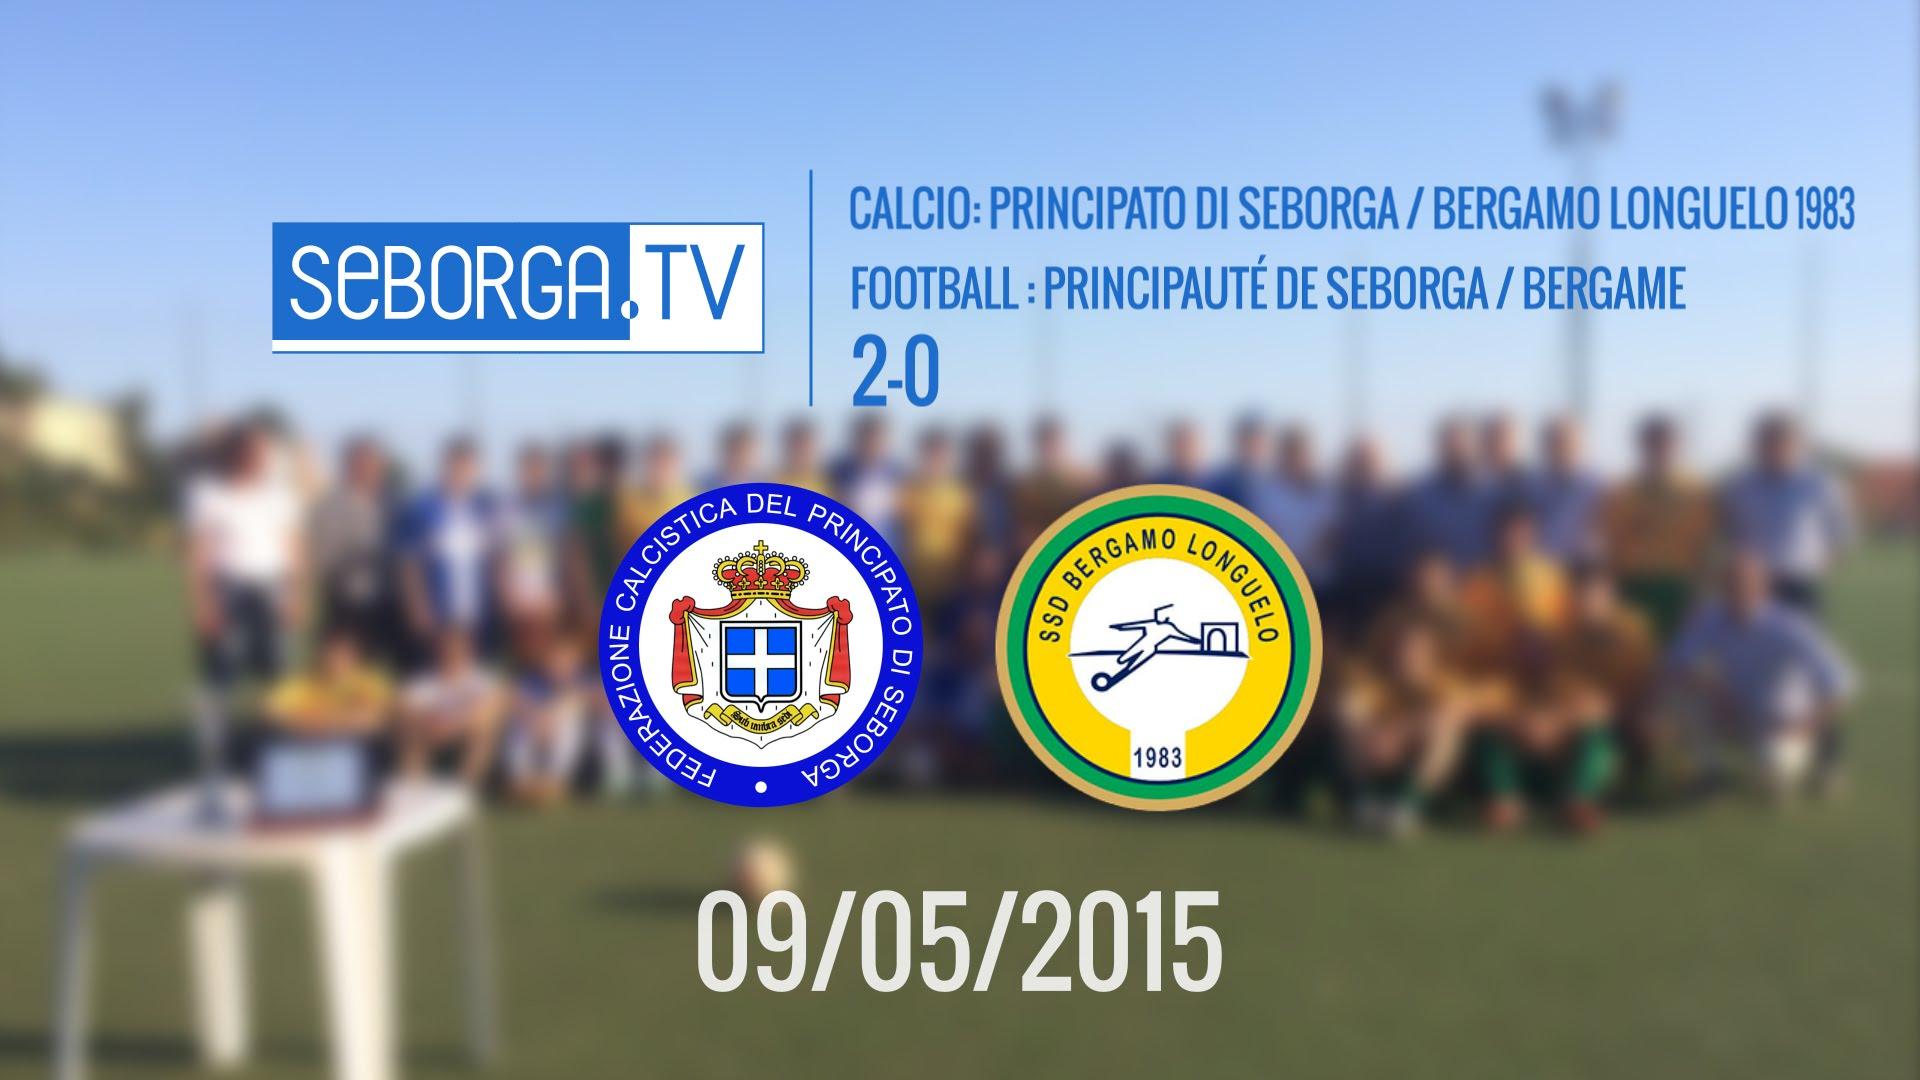 Football: Seborga – Bergamo Longuelo 1983 (2-0) (09/05/2015)